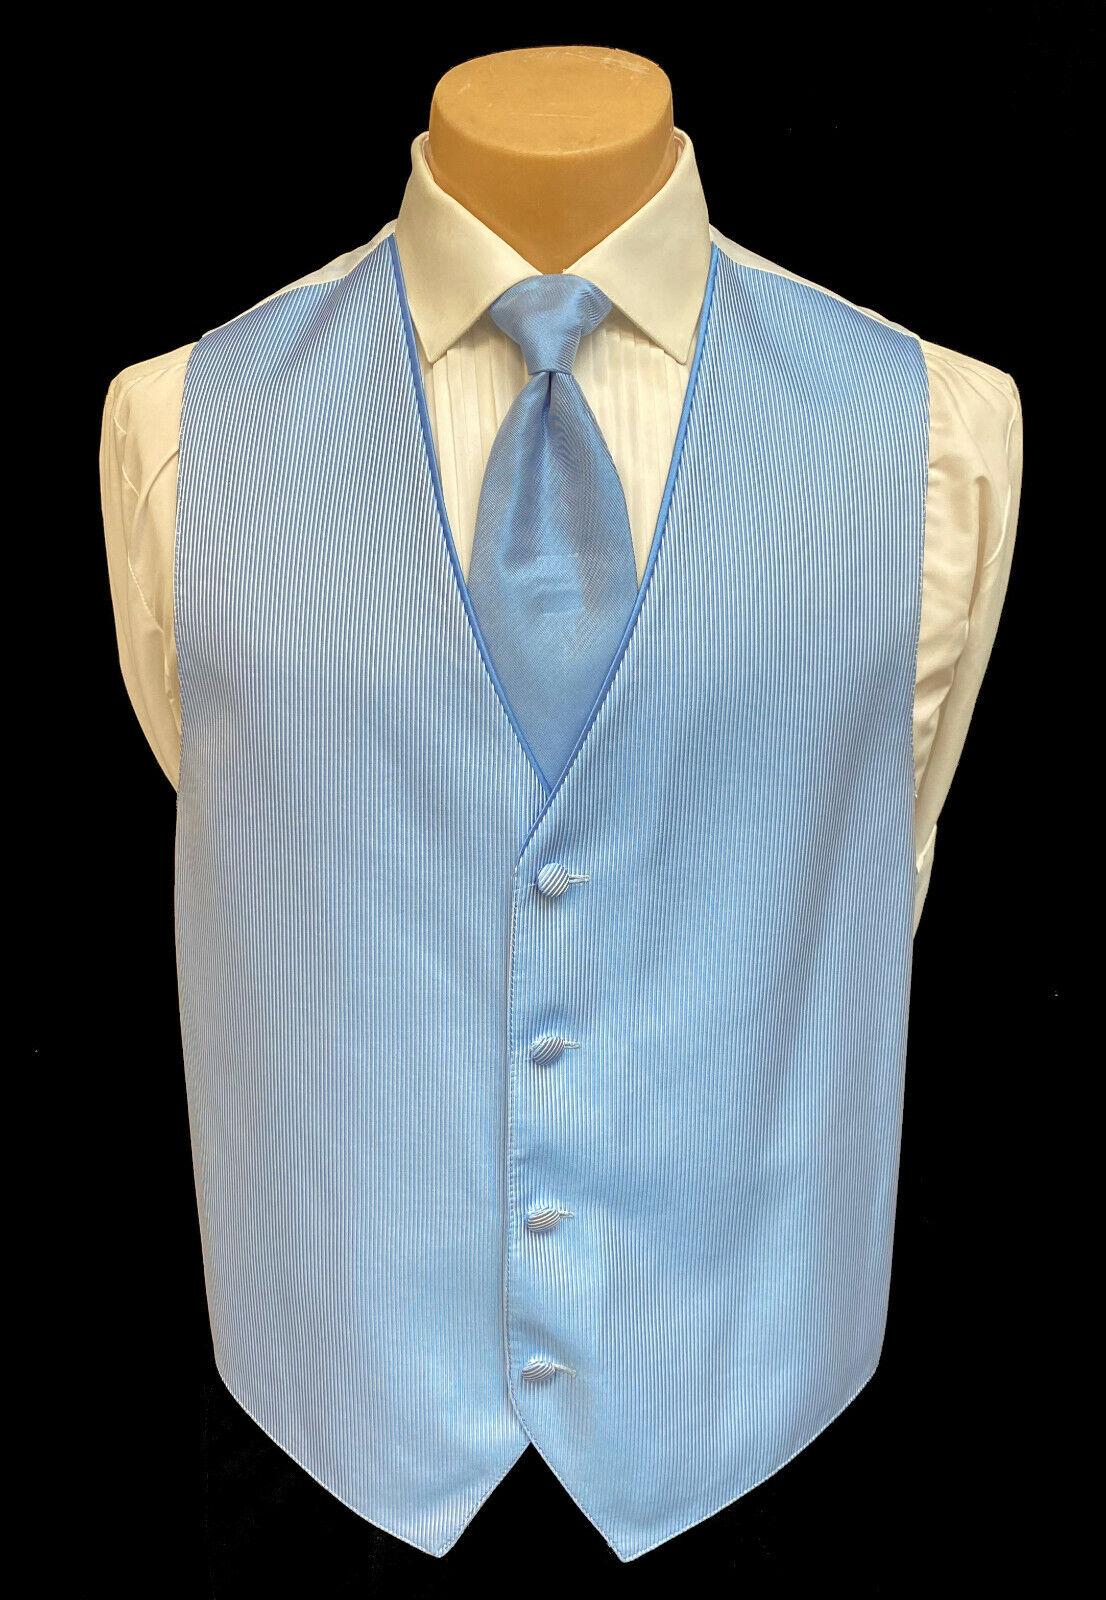 Men's Jean Yves Blue Tuxedo Vest and Tie Formal Wedding Groom Prom Medium M